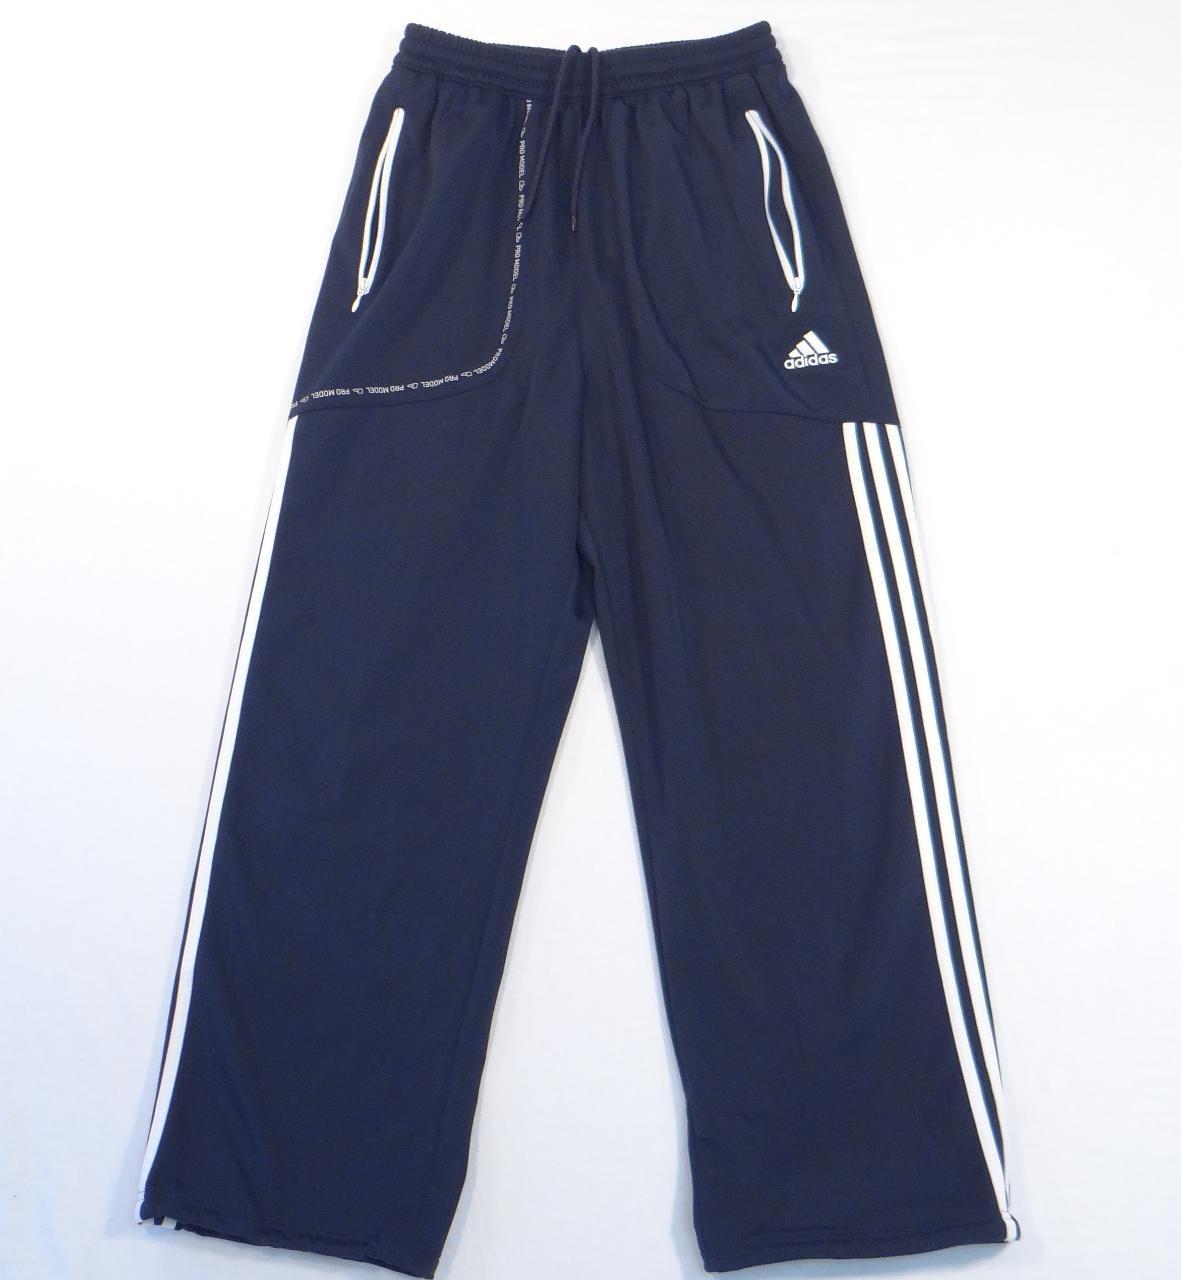 Adidas Signature TS Promodel Navy Blue & White Basketball Pants Men's S NWT - $52.49